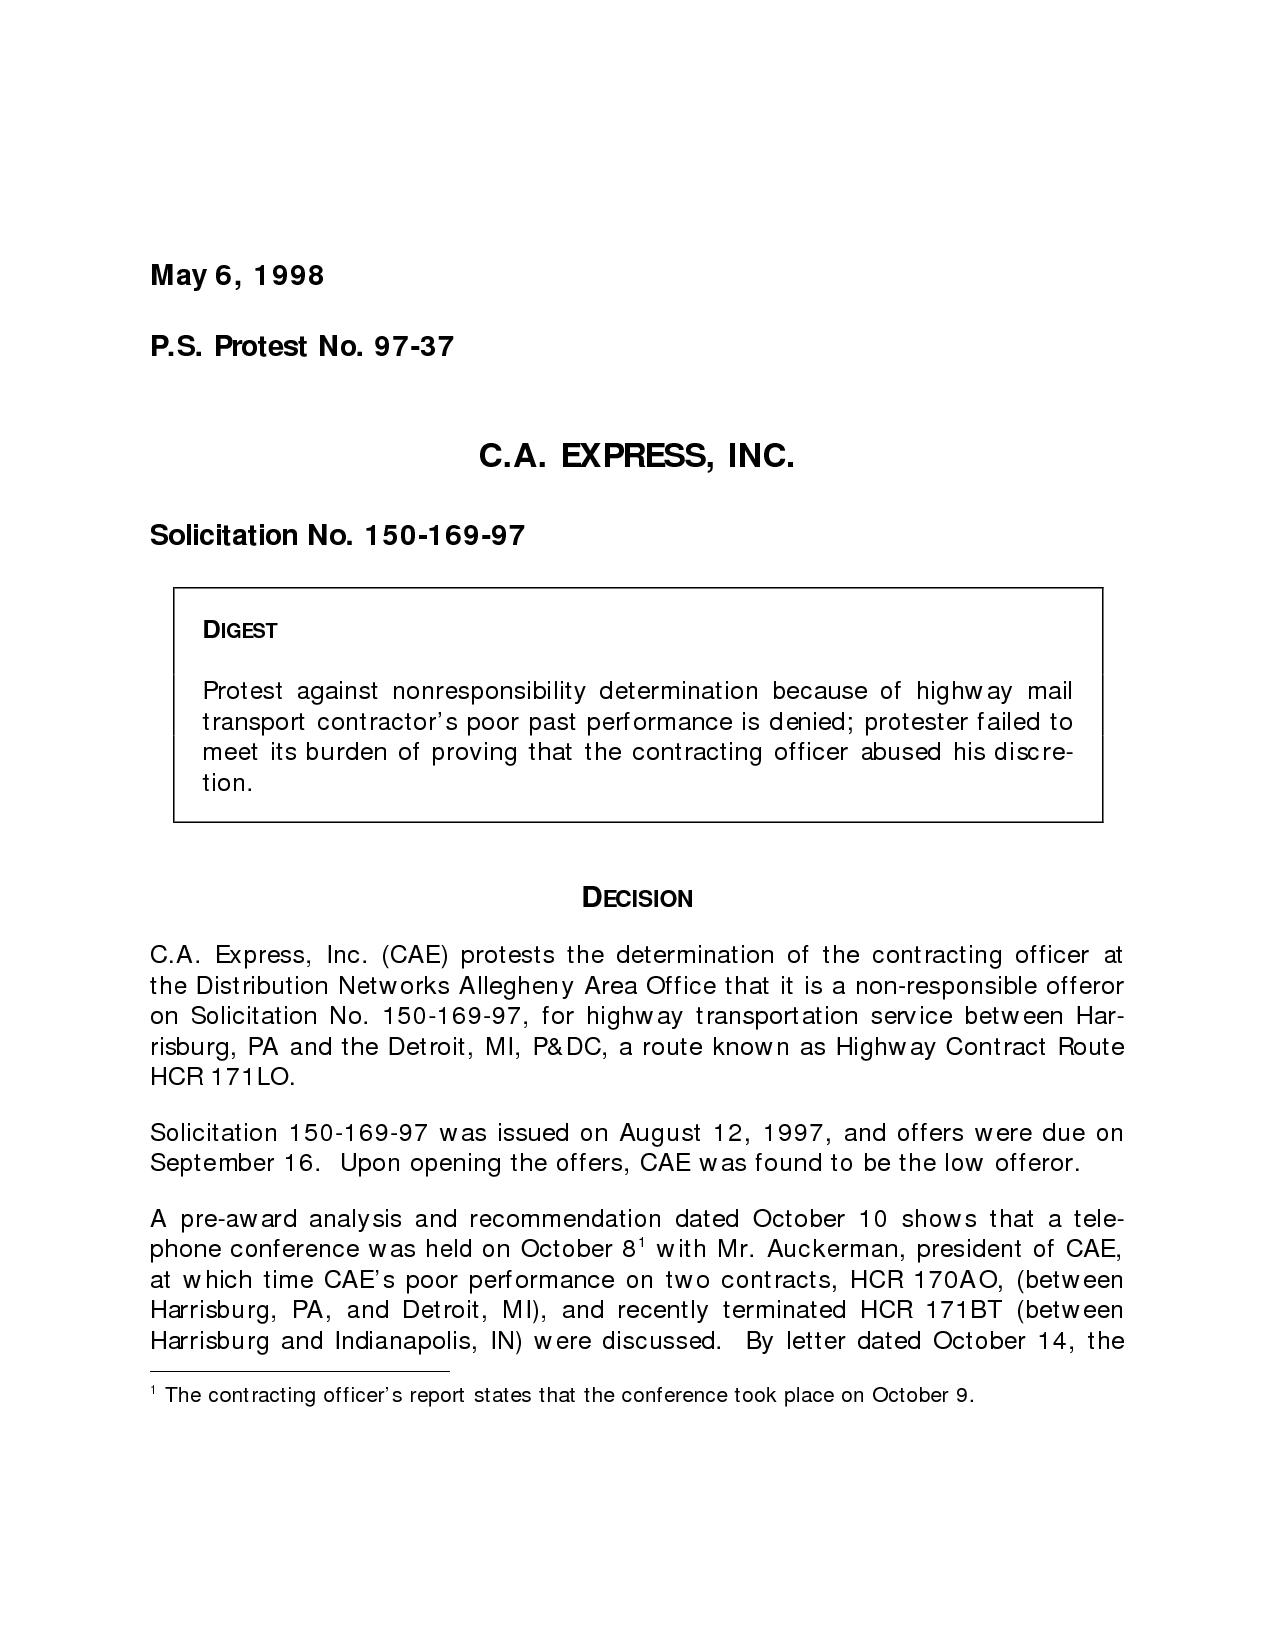 Termination letter sample uae how write poor terminating employee termination letter sample uae how write poor terminating employee due downsizing hashdoc spiritdancerdesigns Images